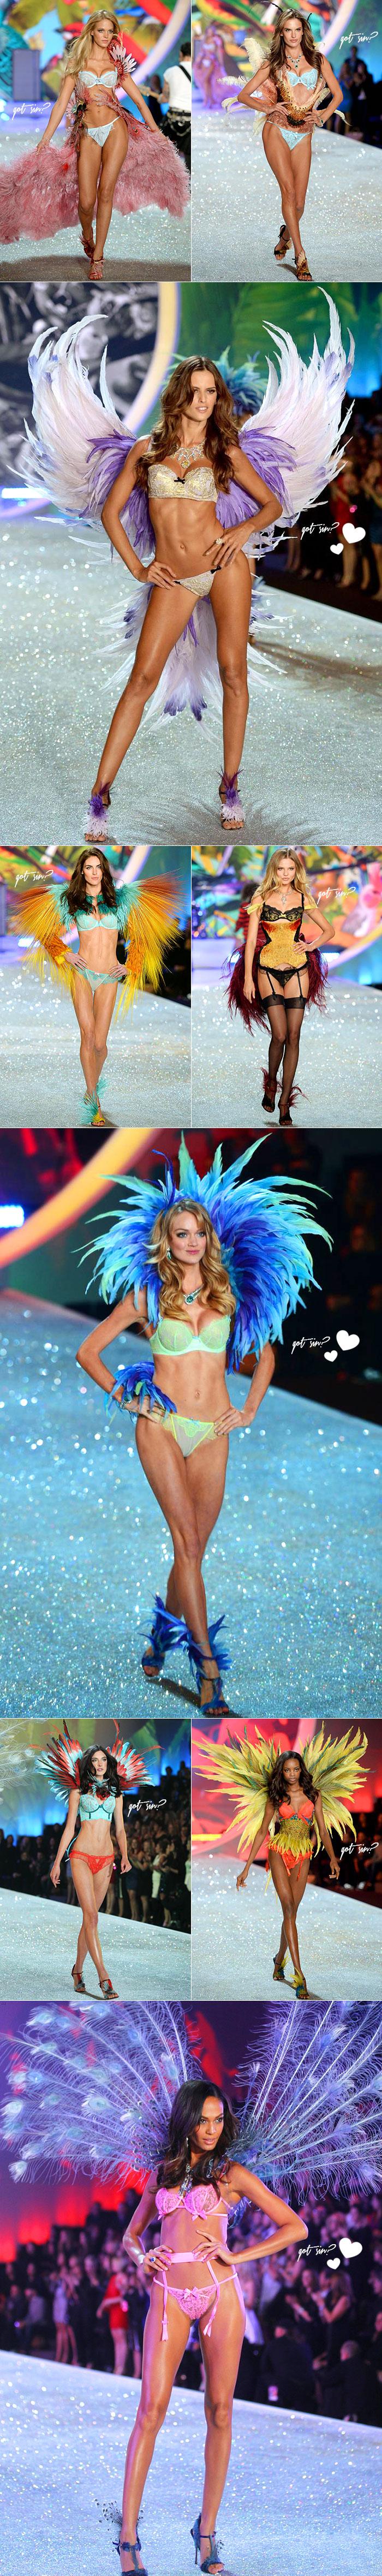 desfile-victorias-secret-fashion-show-blog-got-sin-alessandra-ambrosio-sexy-lingerie-penas-plumas-01